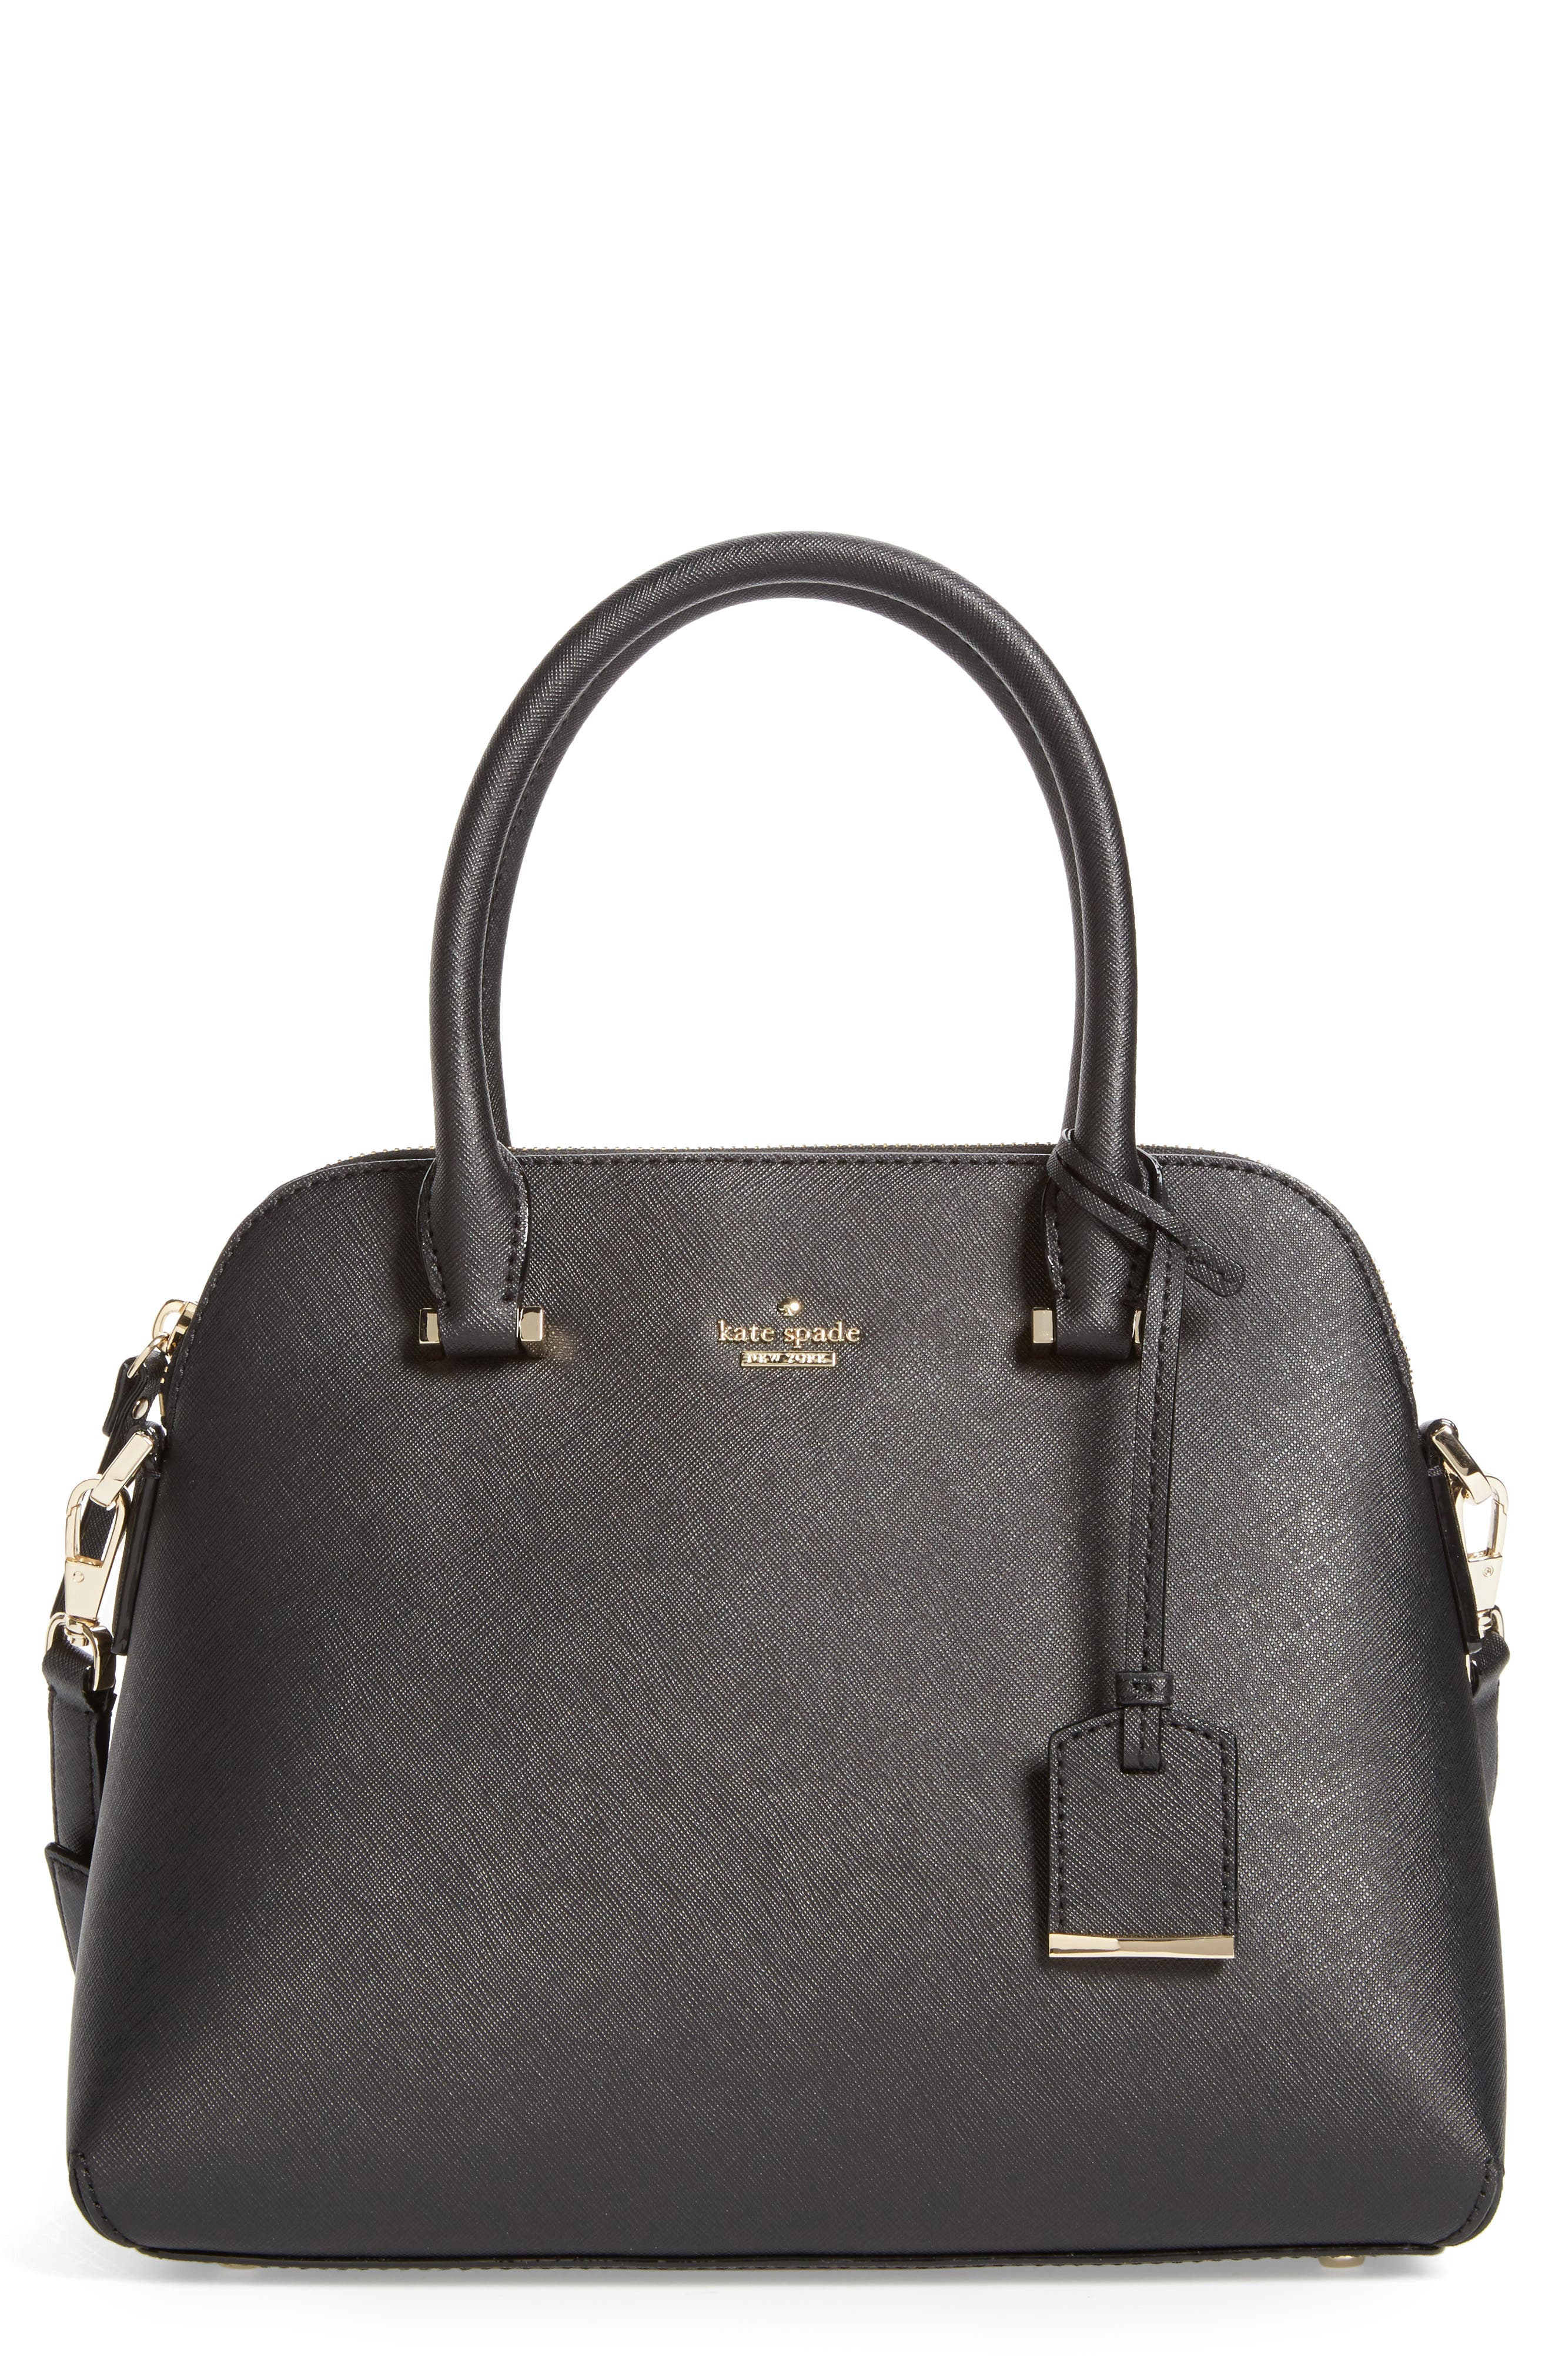 Main Image - kate spade new york cameron street maise leather satchel